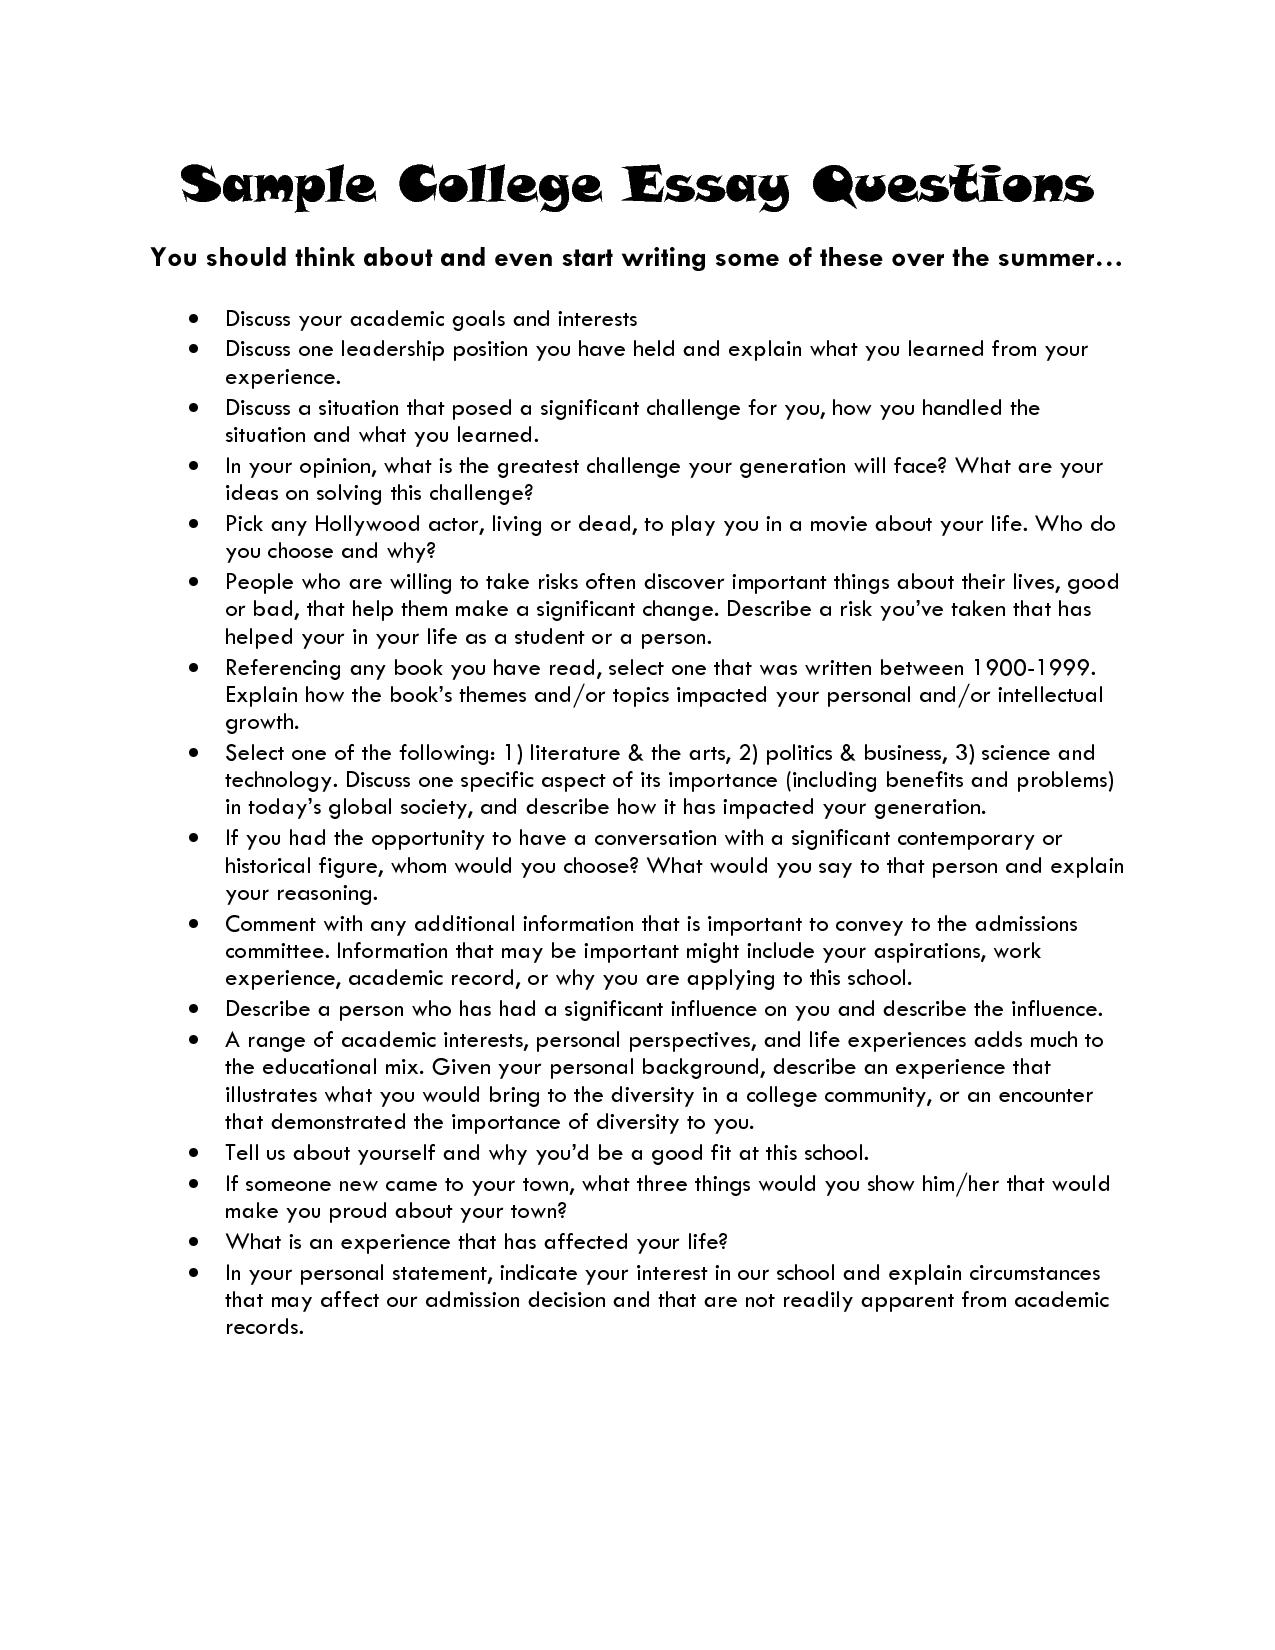 Perspective essay rubric